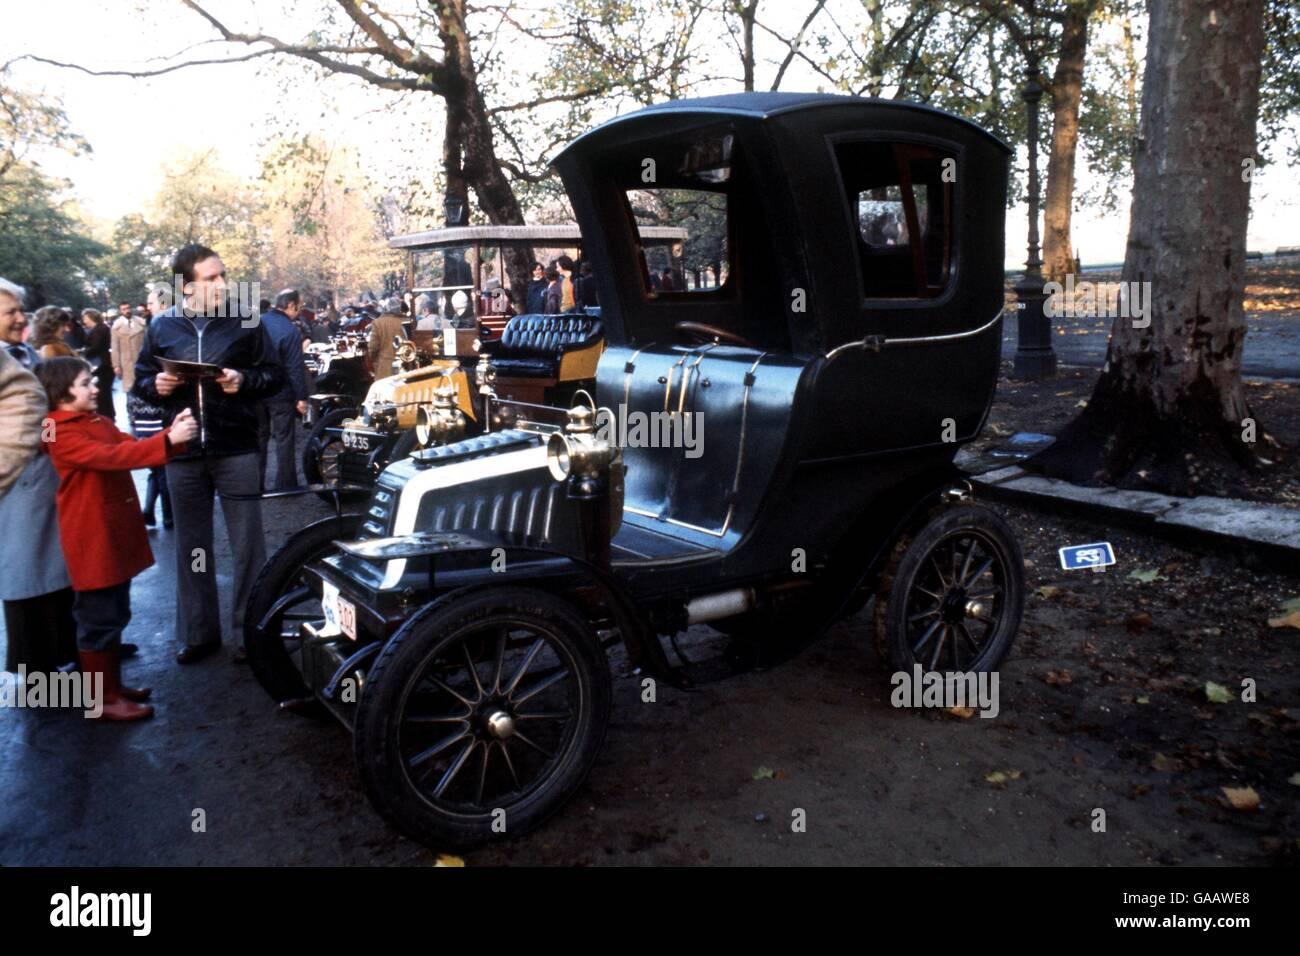 Rallying - VCC London to Brighton Veteran Car Rally Stock Photo ...